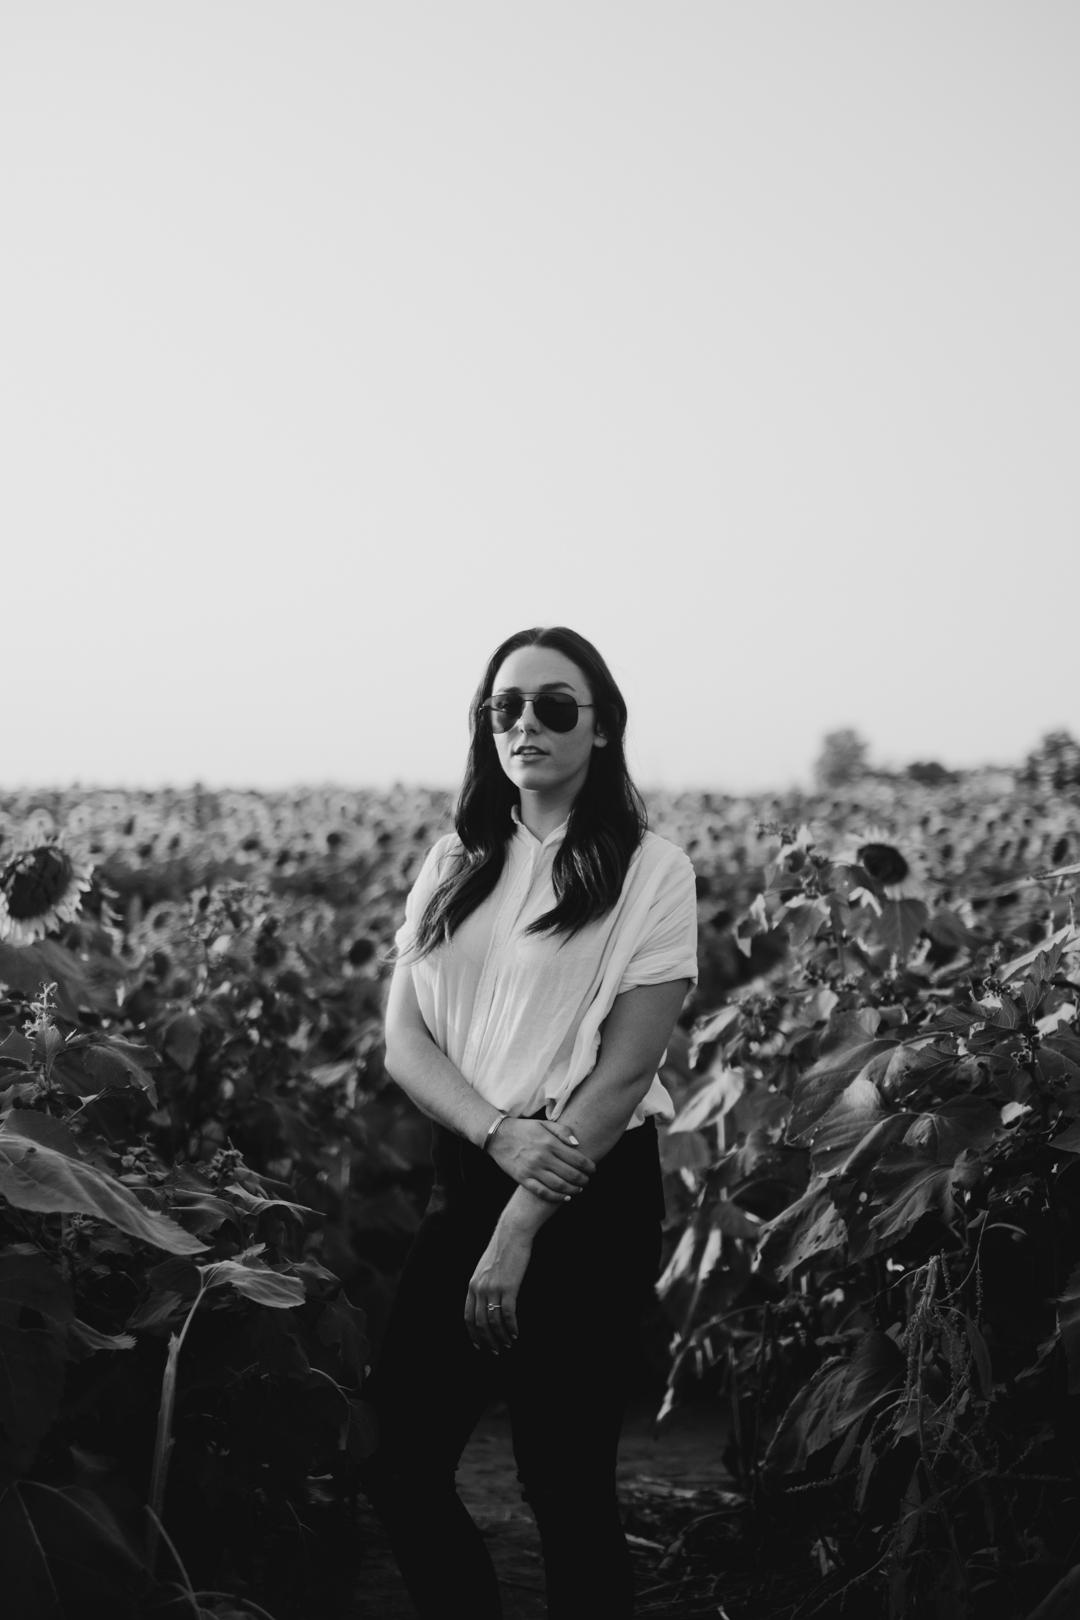 20170909_Grinters Farms Sunflower Fields Lawrence Kansas__13.jpg